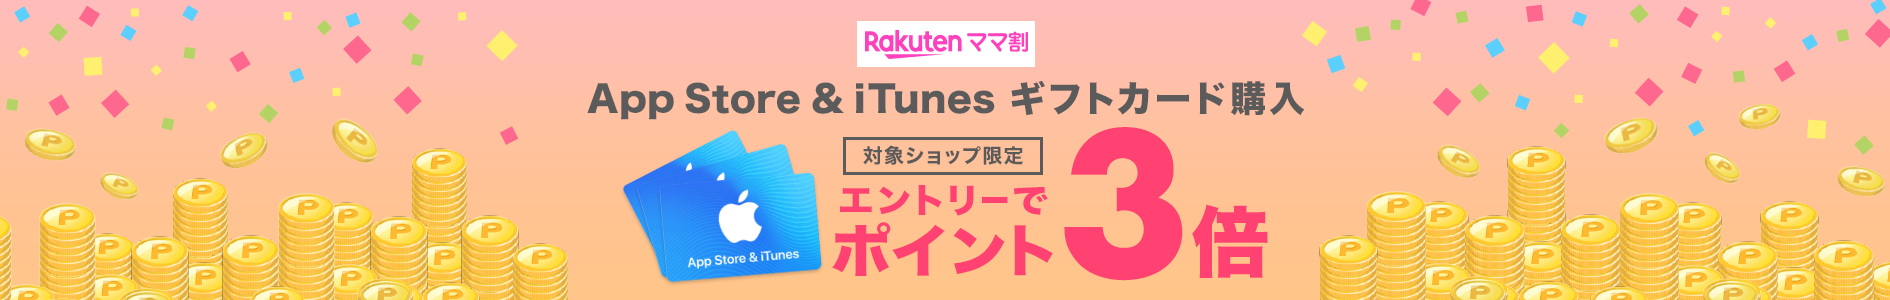 App Store & iTunes ギフトカード購入キャンペーン